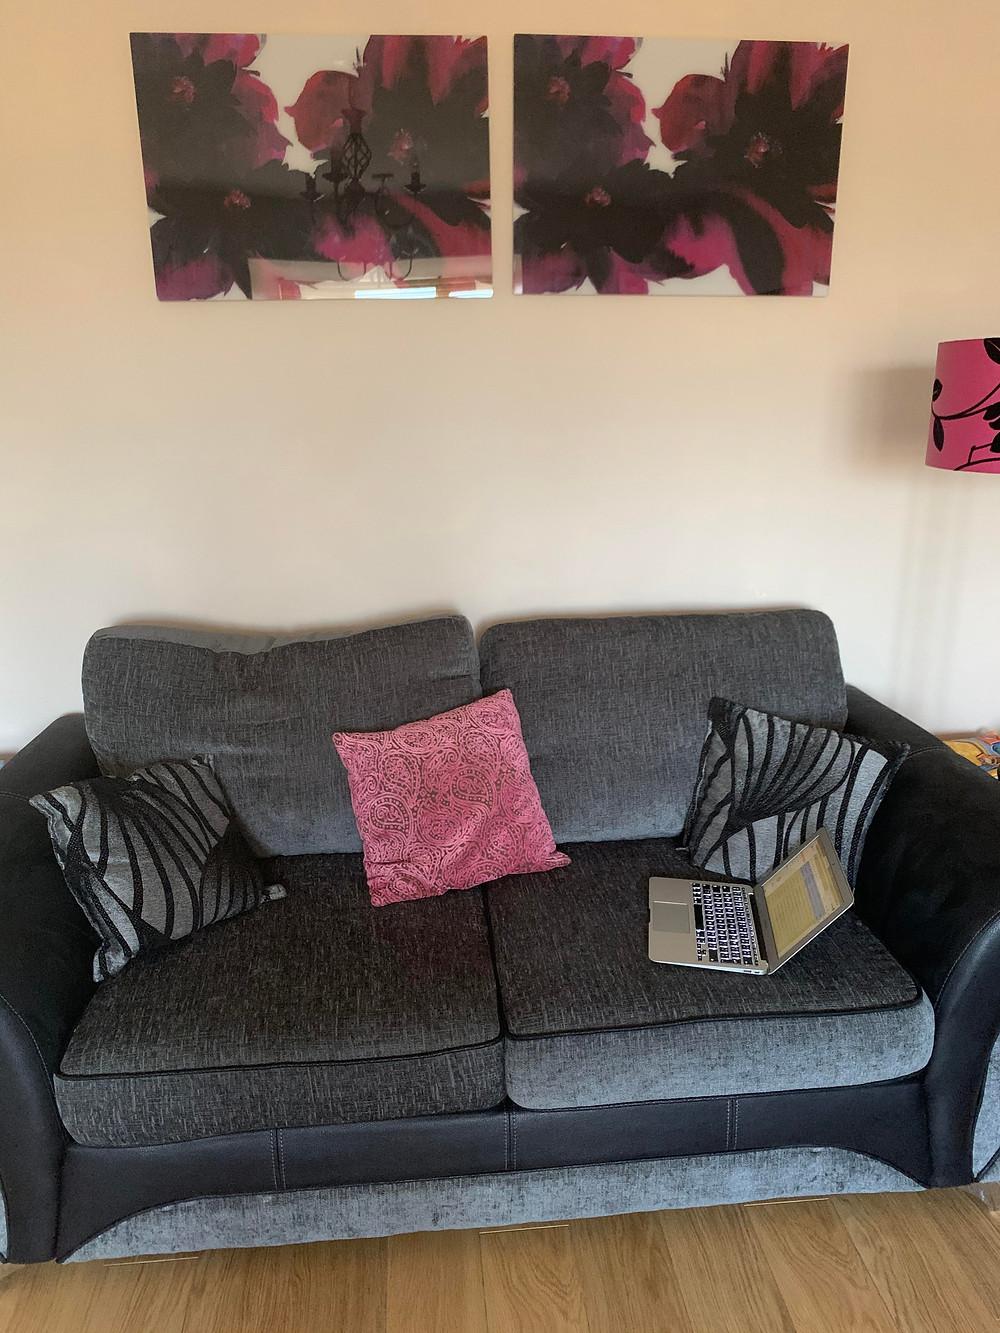 Keisha's workspace, her sofa